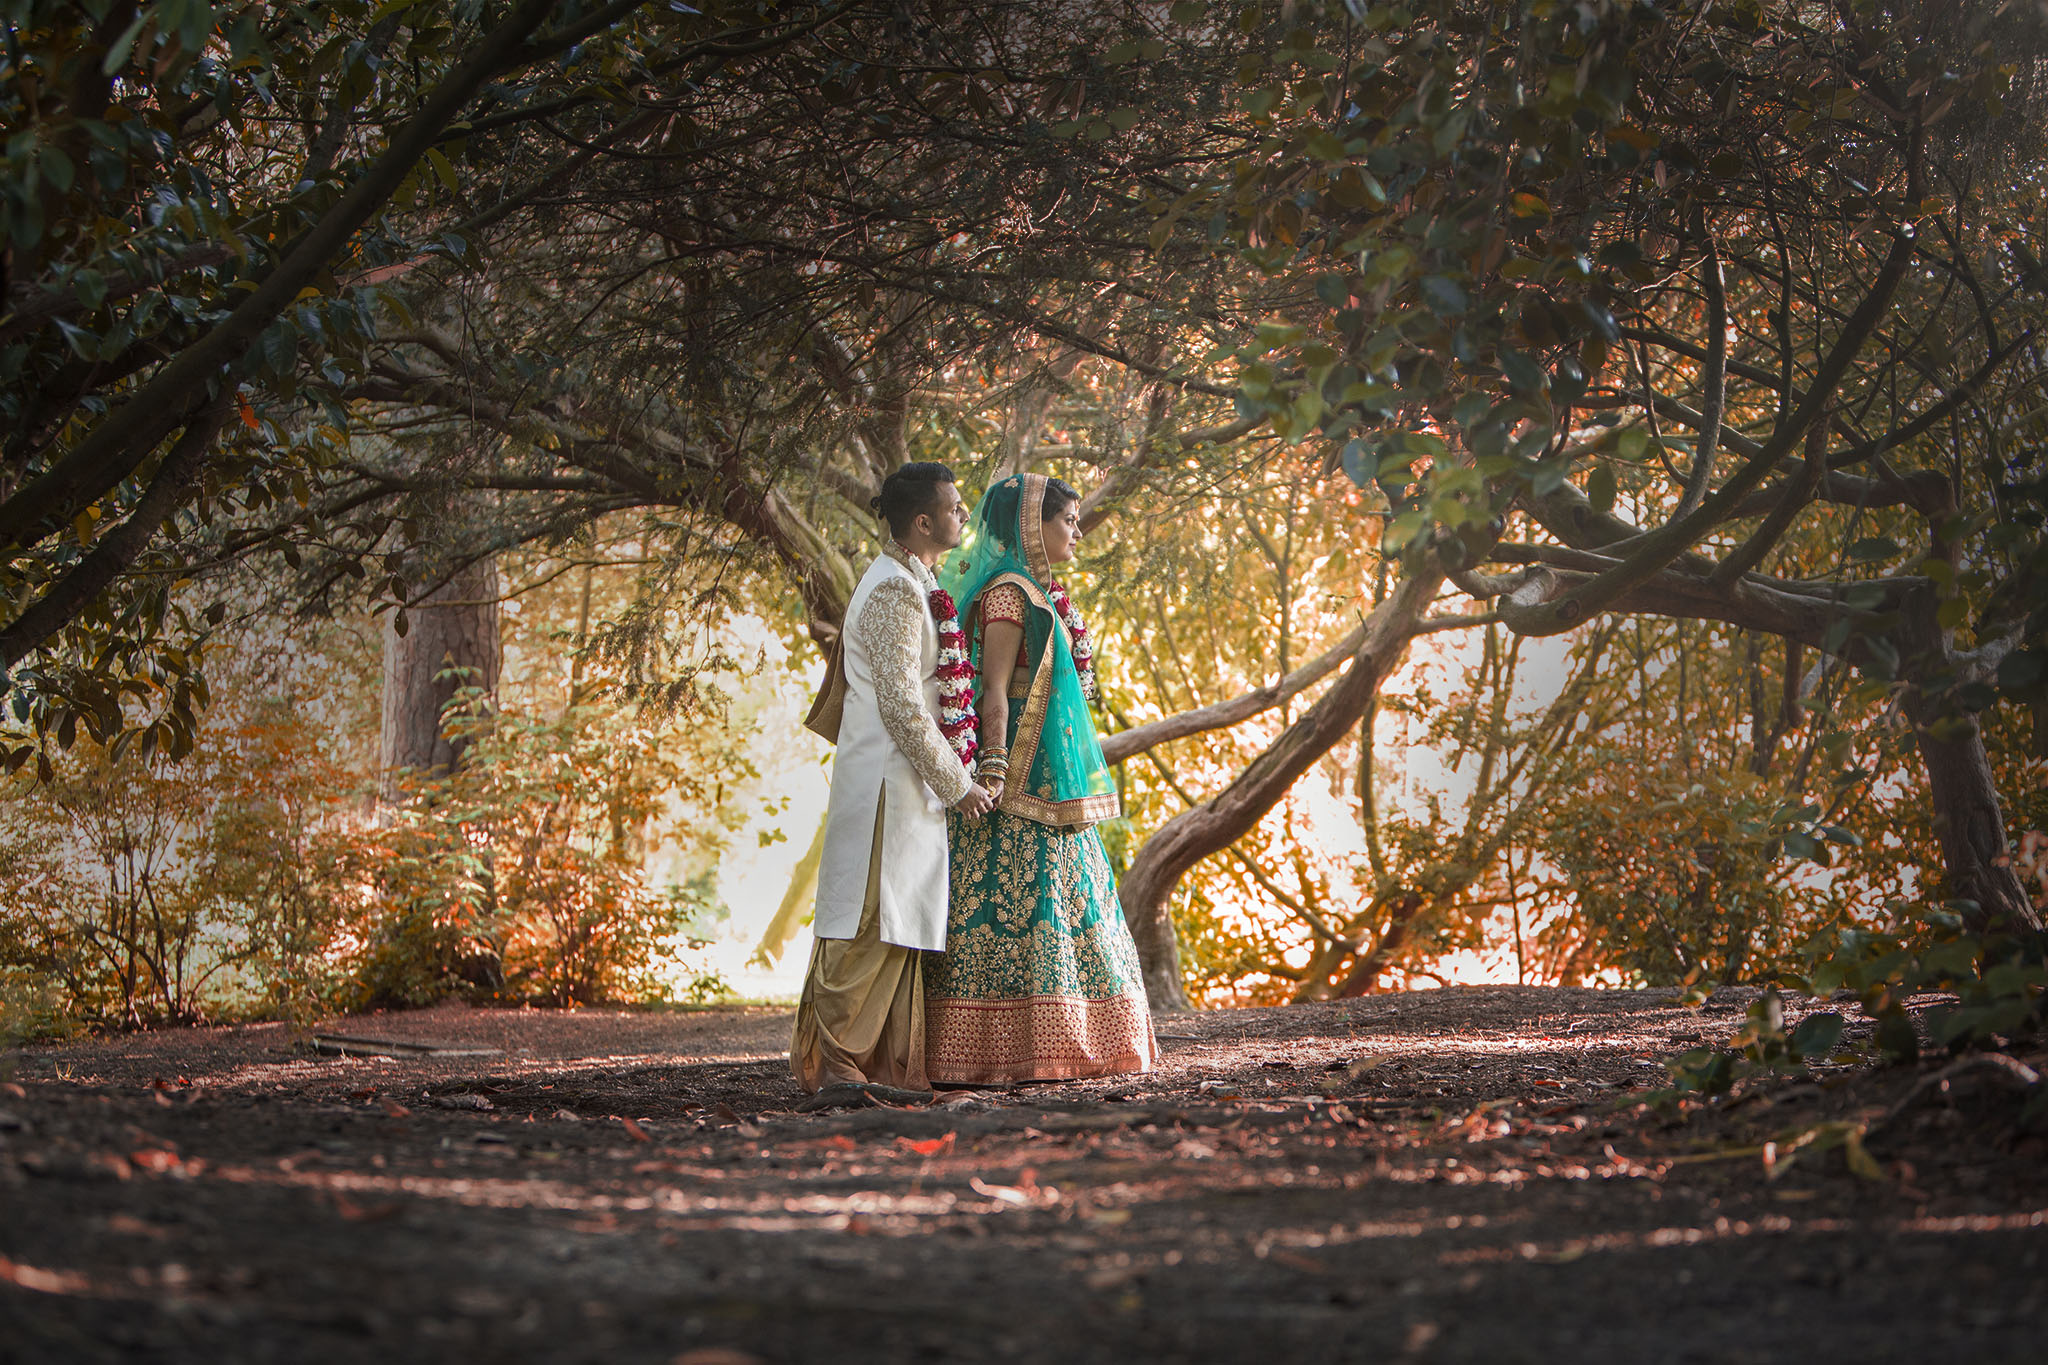 Jigna & Sadbhuja Wedding Gallery